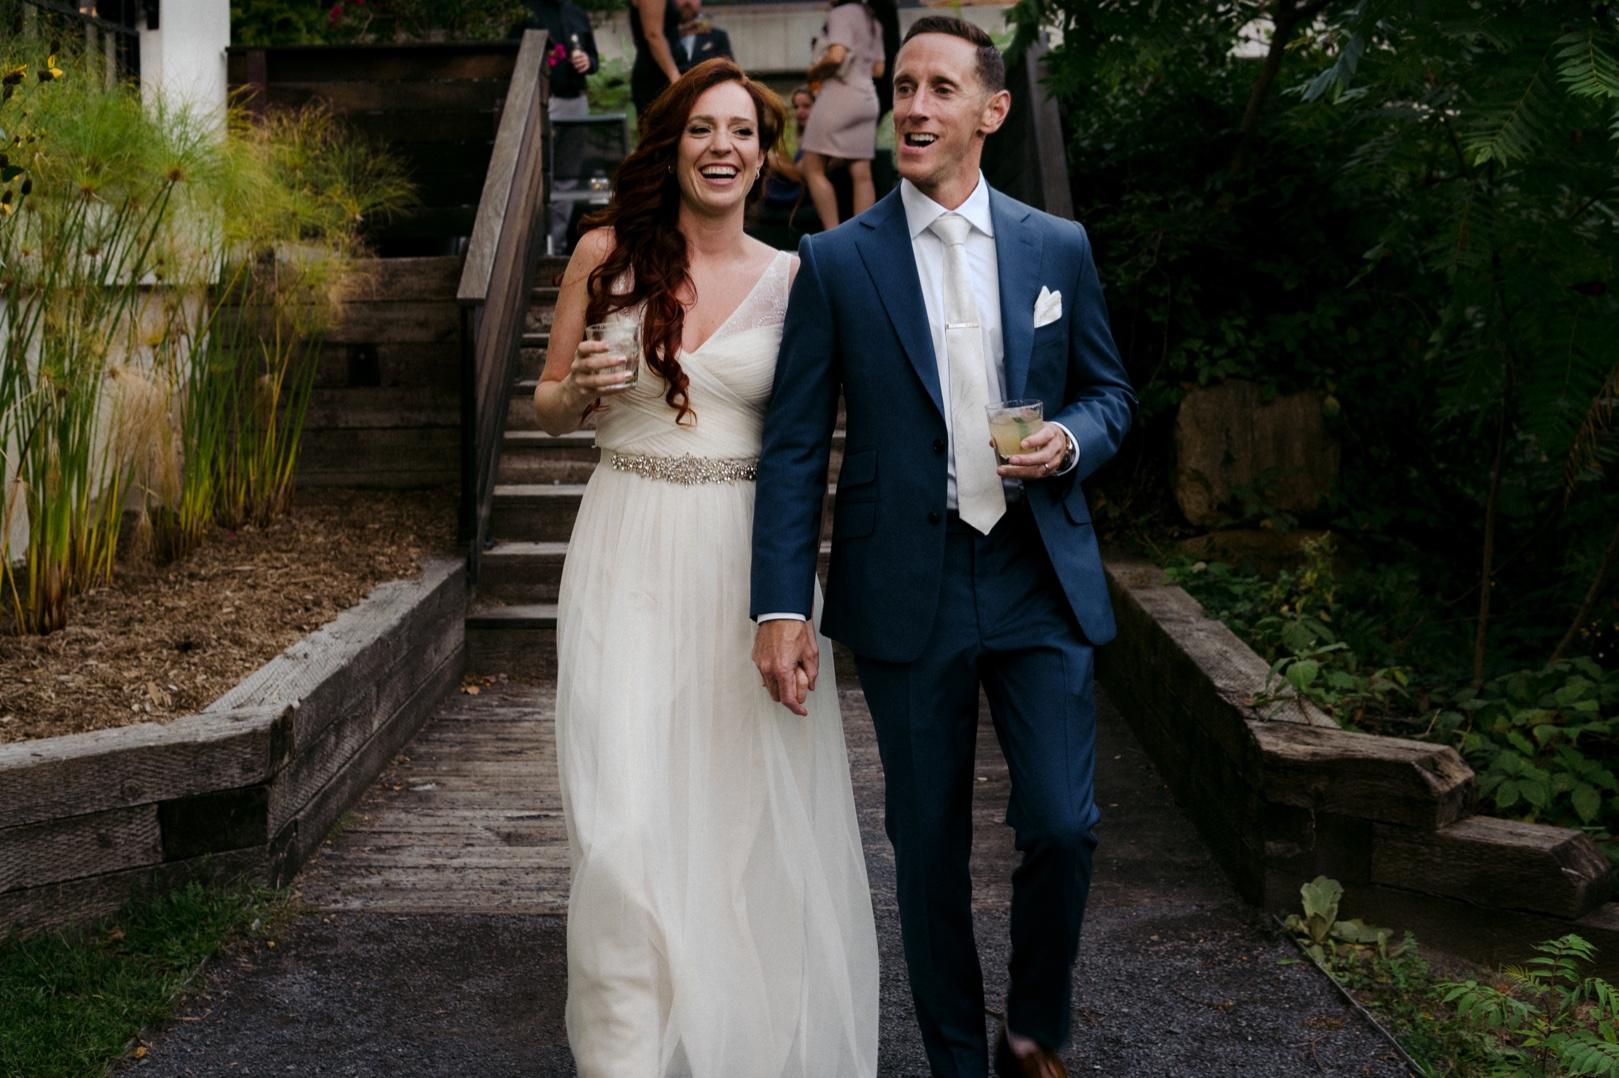 40_JACQUELINE RICH WEDDING AJ-392_Events_Weddings_2018_Travel_Engagement_Photography_best_Portraits.jpg